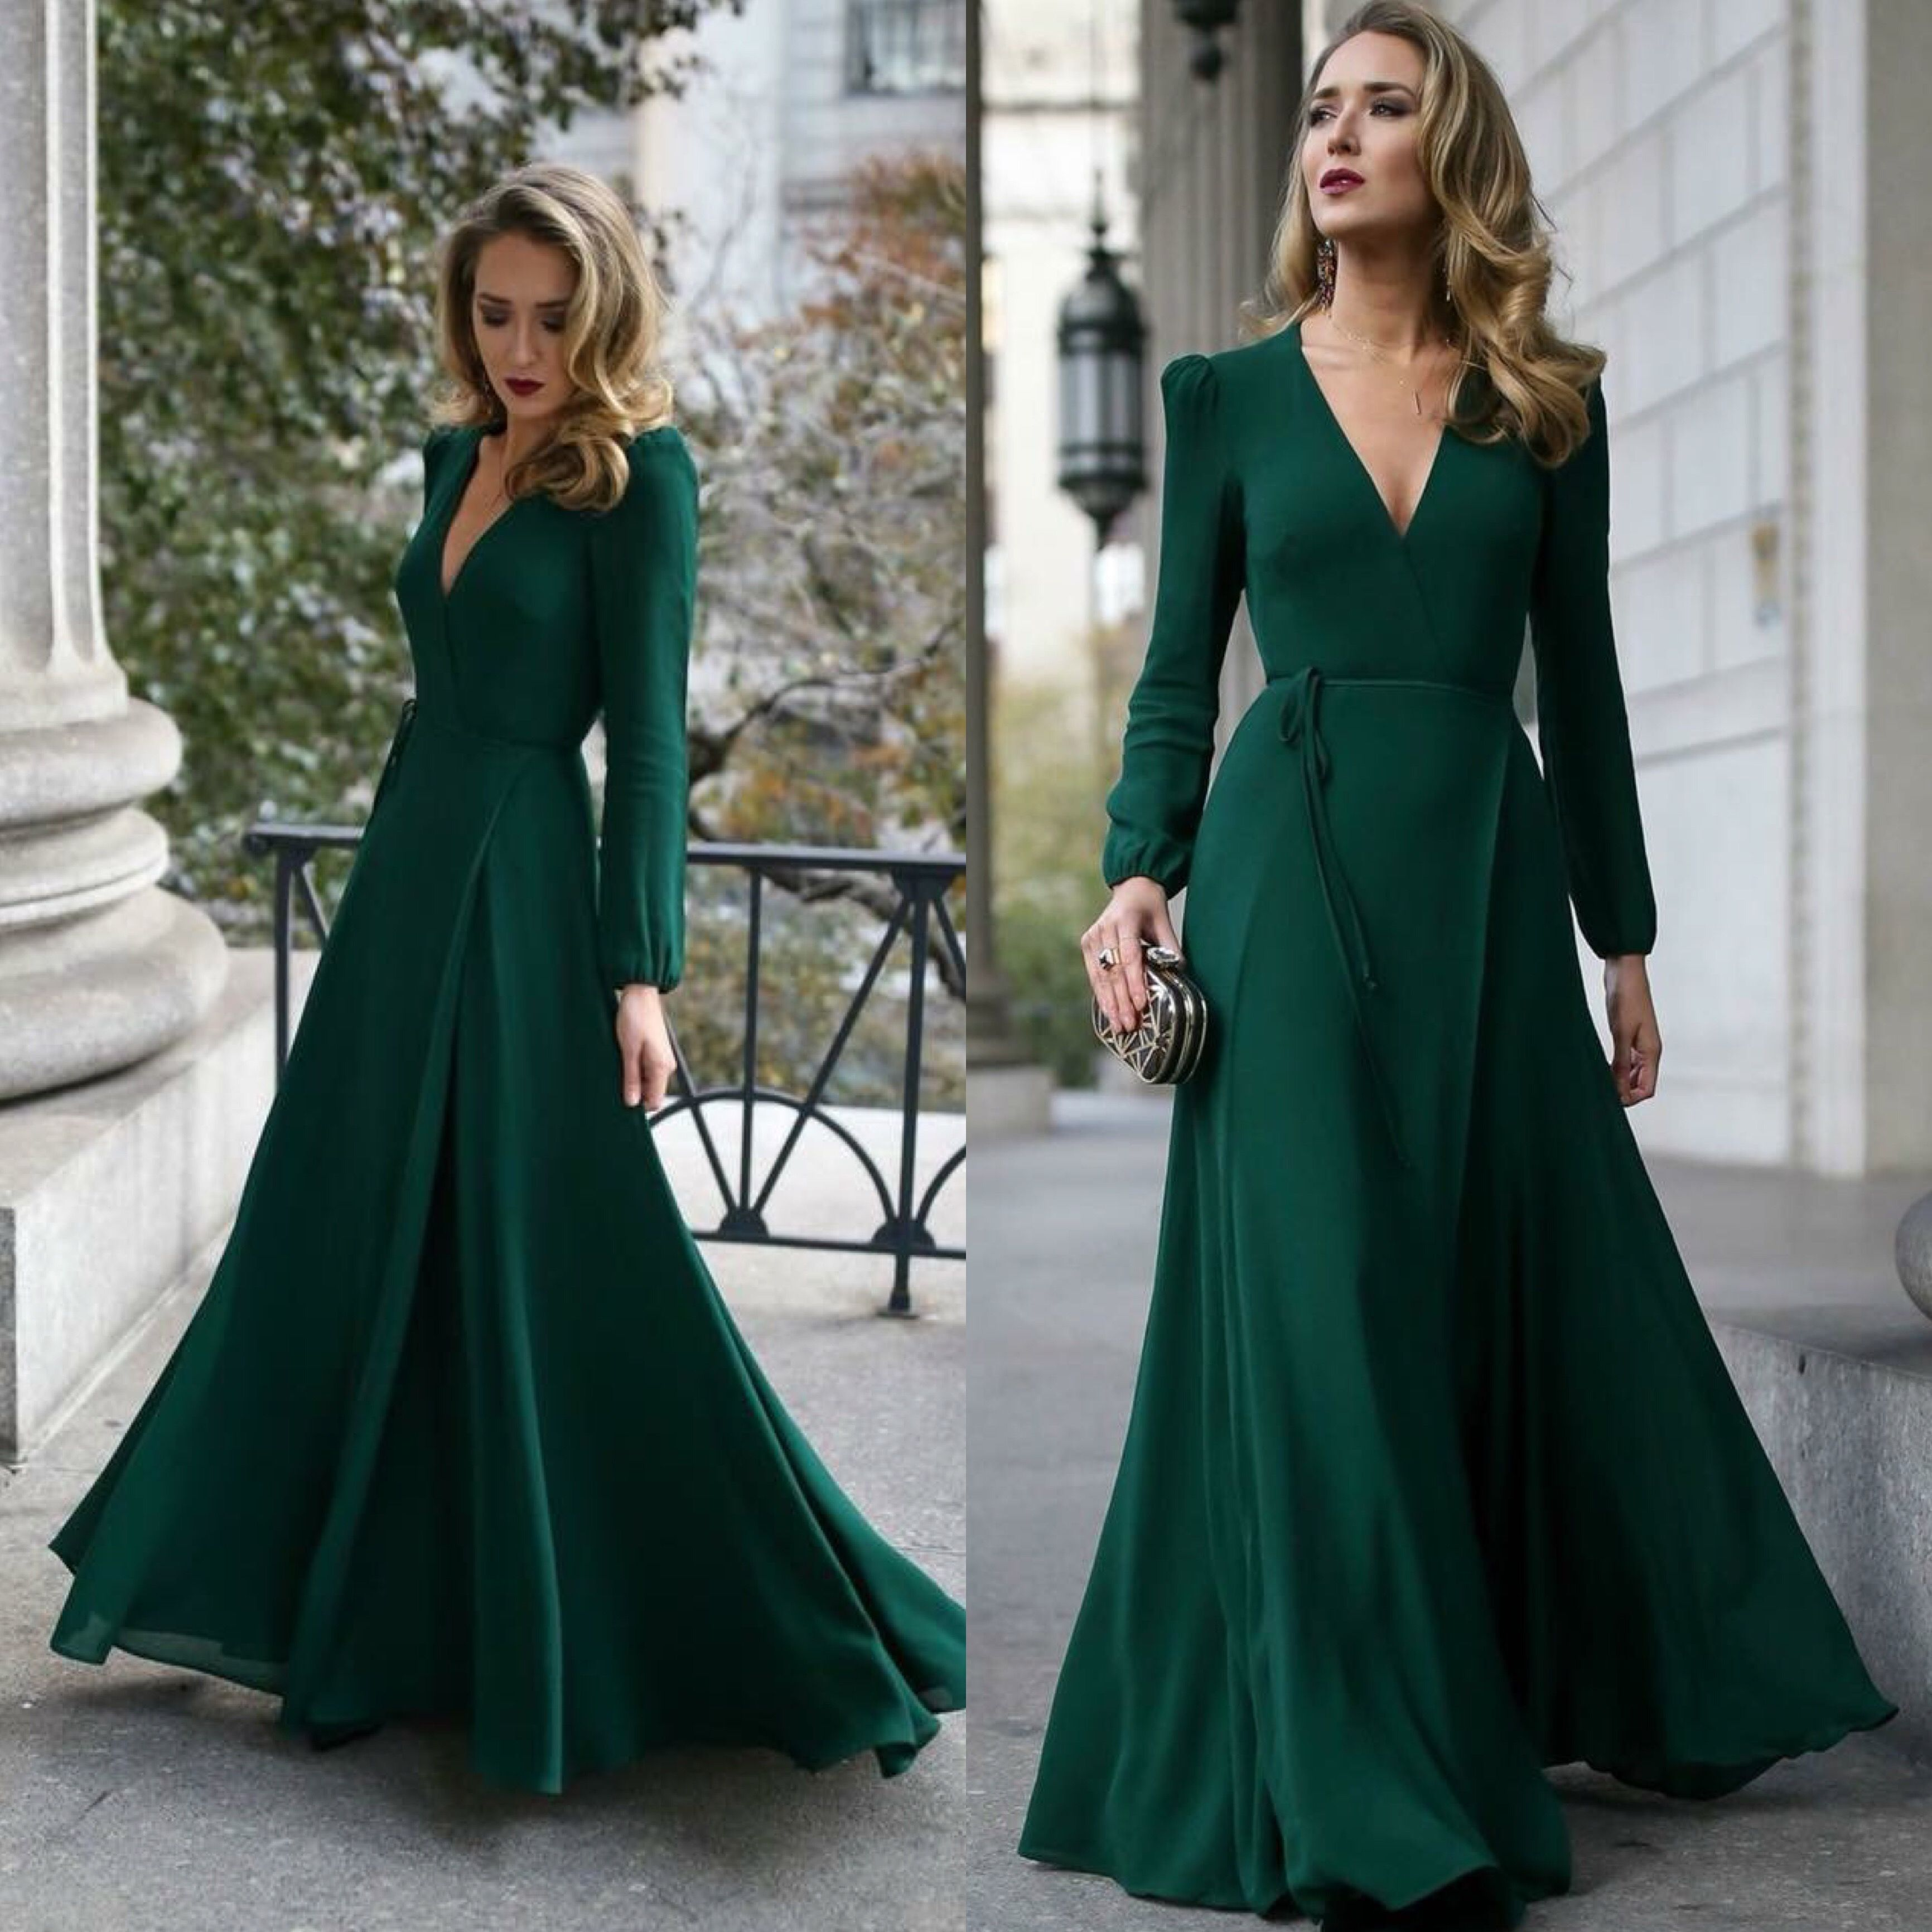 Afghan Nekah Wedding Green Dress Prom Dresses Long With Sleeves Green Prom Dress Long Prom Dresses With Sleeves